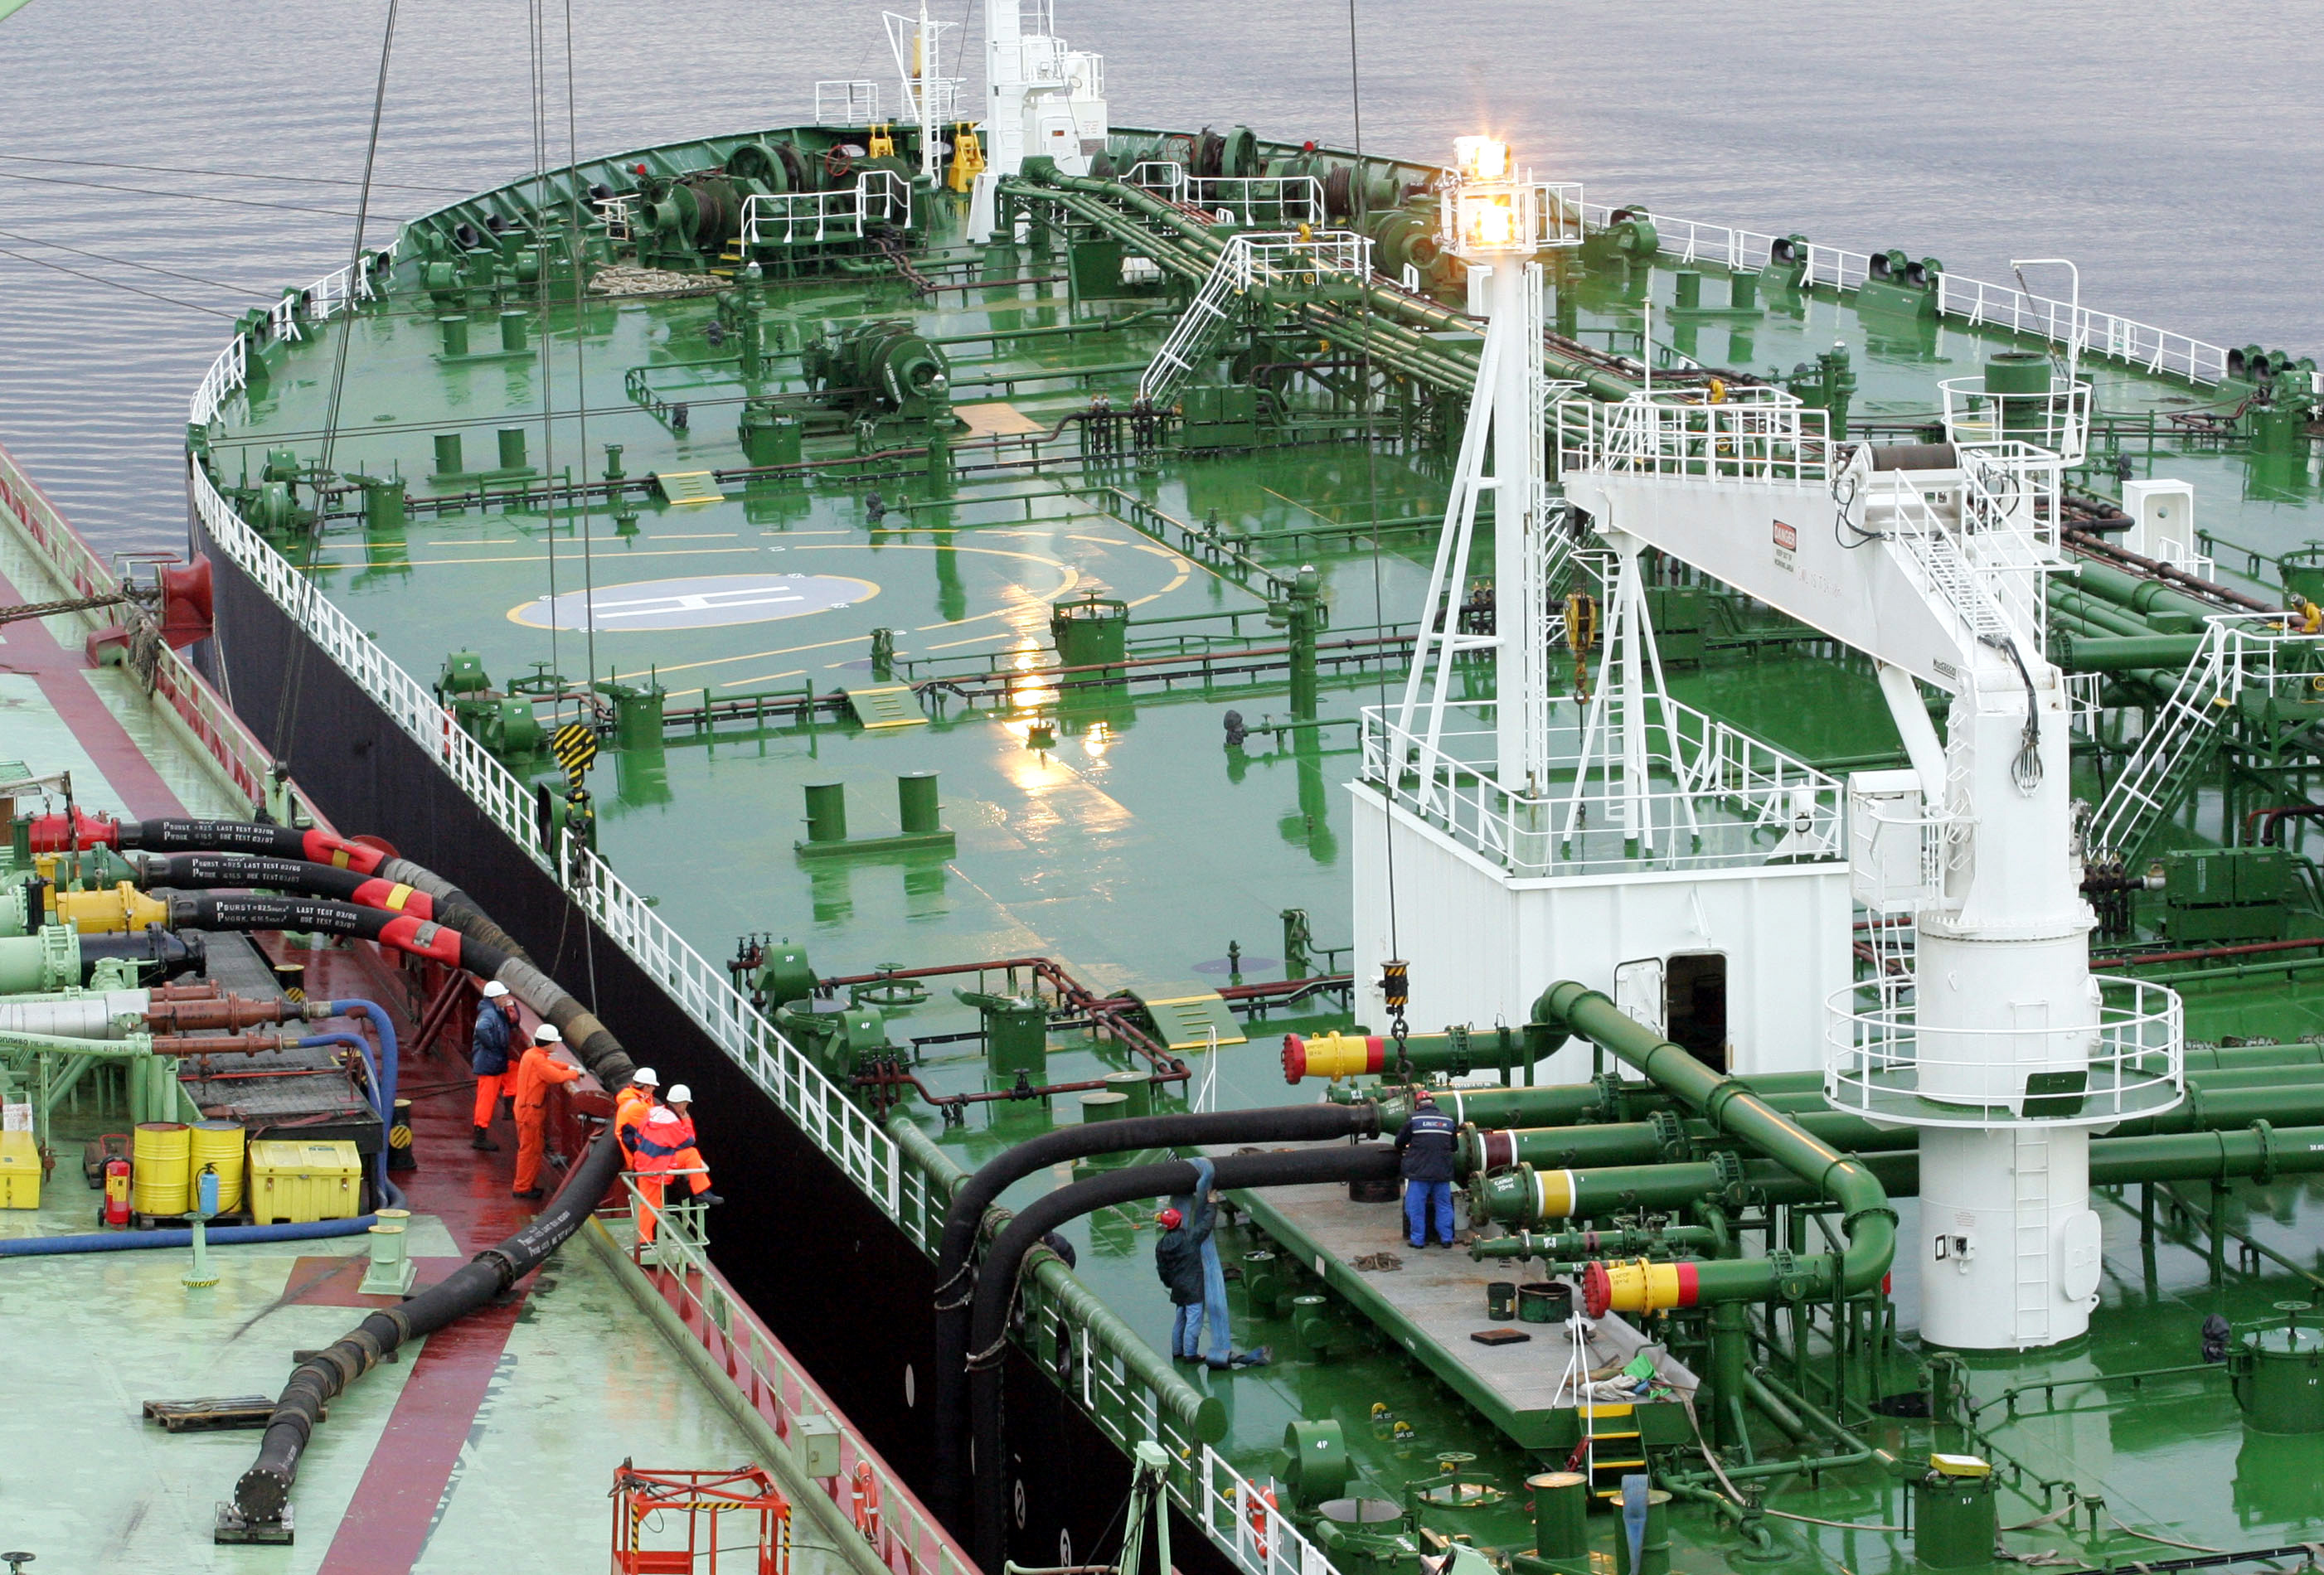 russian-state-oil-company-interested-in-norwegian-shelf